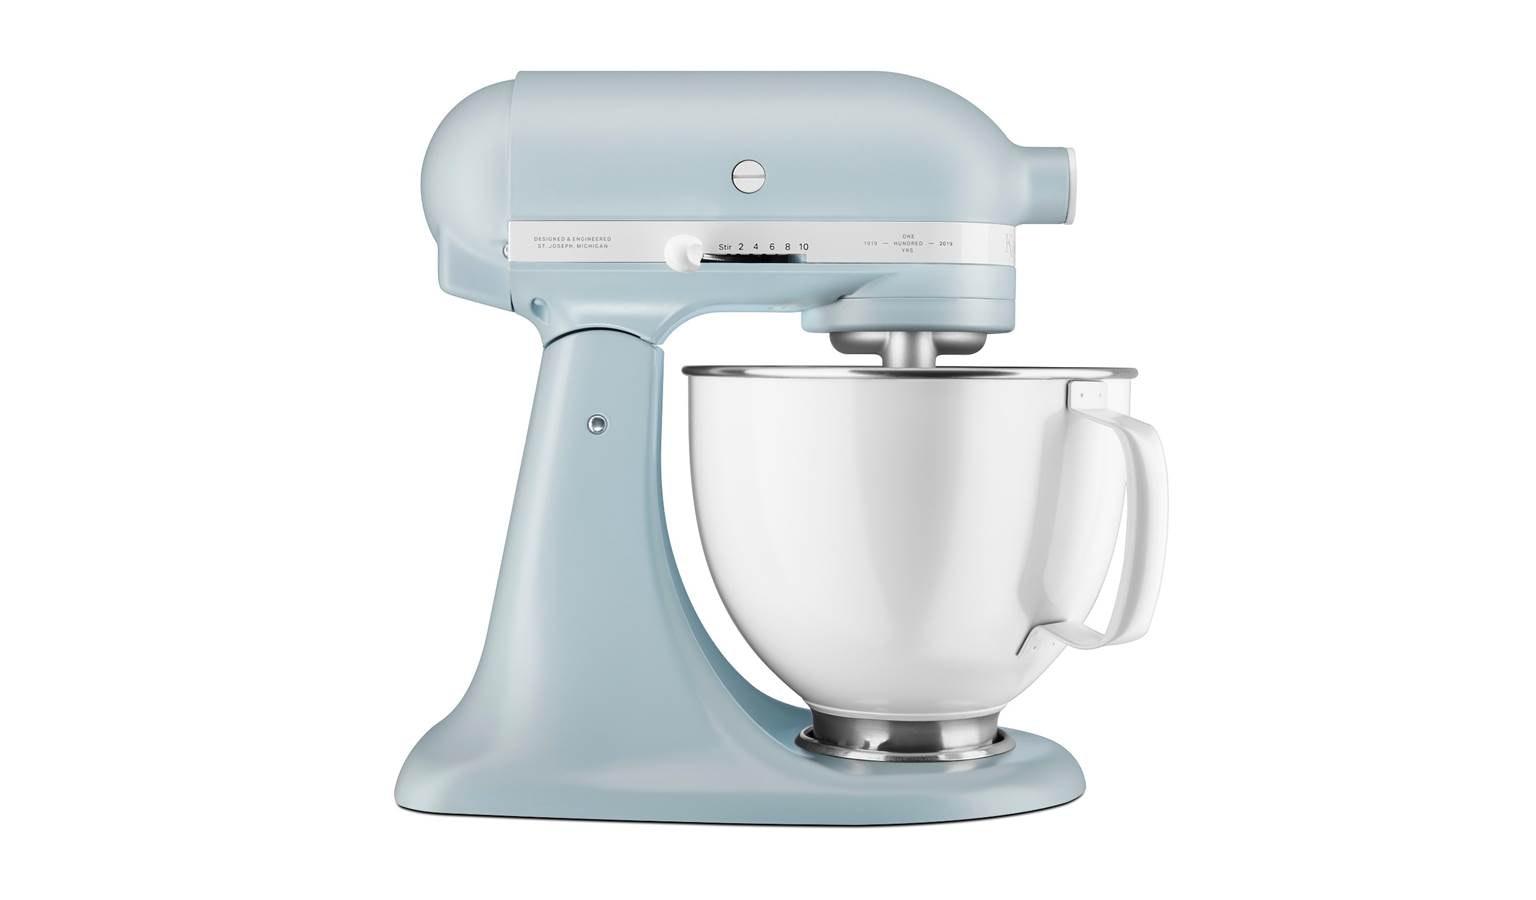 kitchenaid limited edition 5ksm 180rpmb stand mixer misty blue rh harveynorman com my